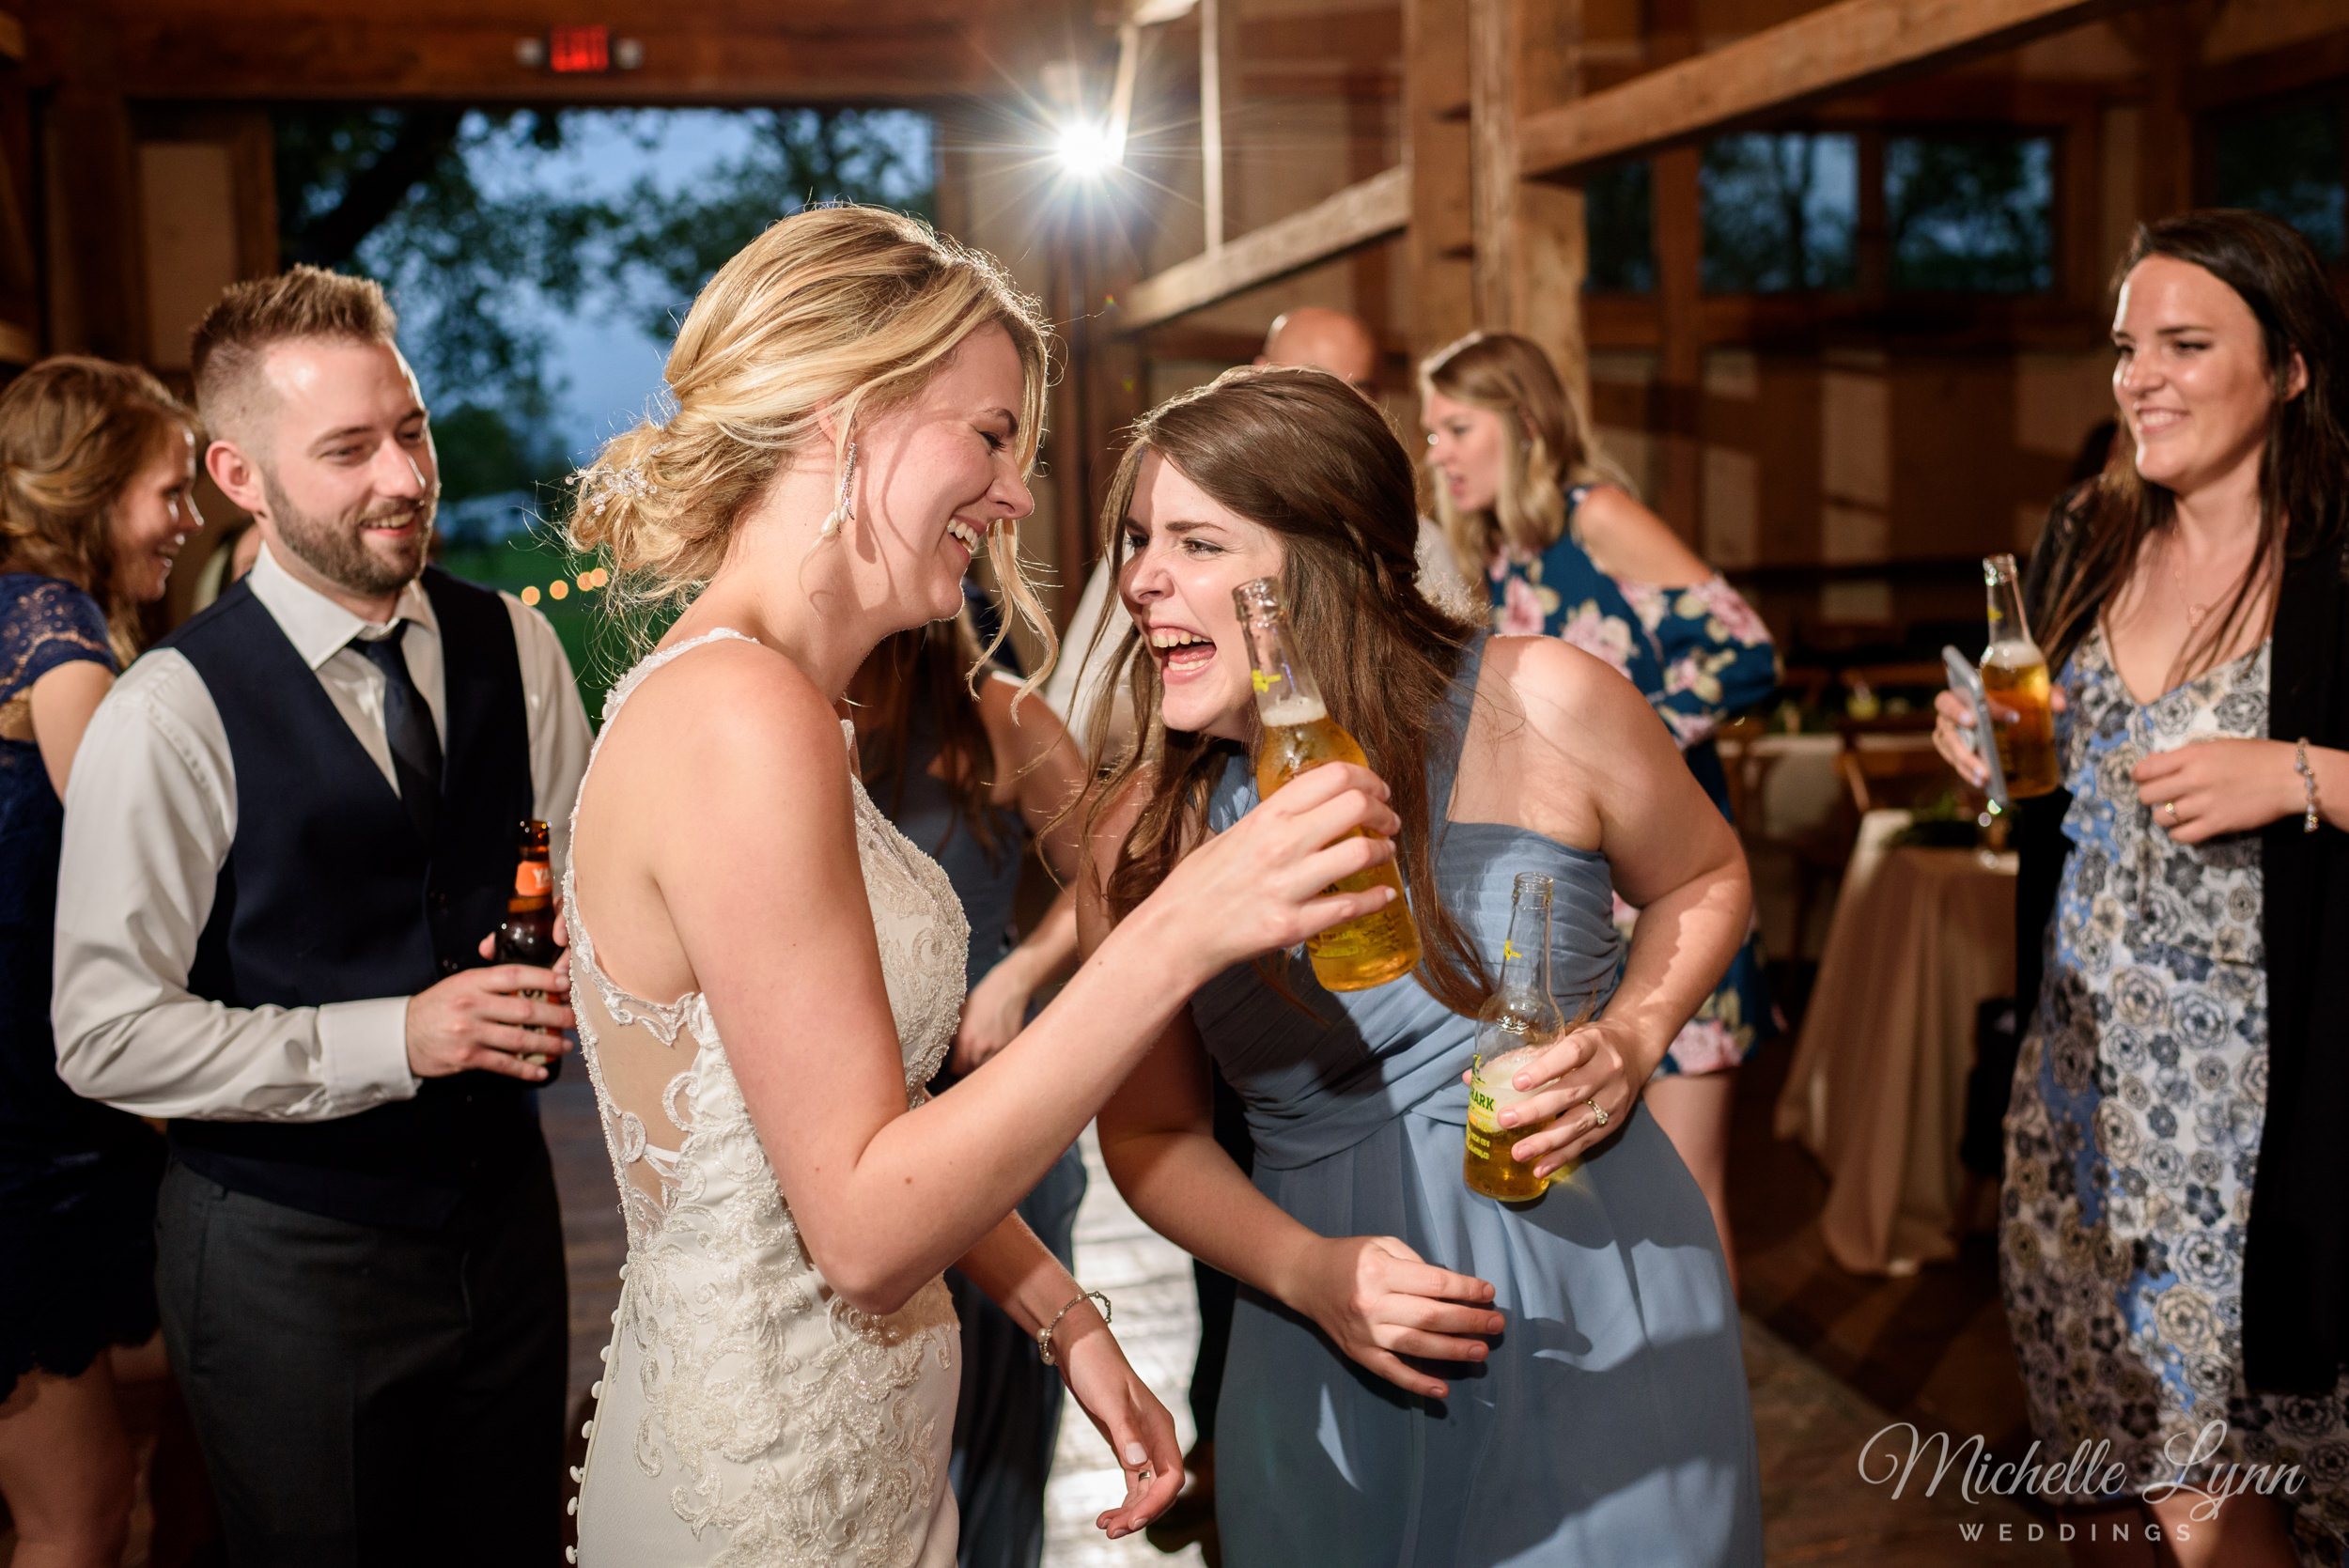 mlw-the-farm-bakery-and-events-wedding-photos-85.jpg